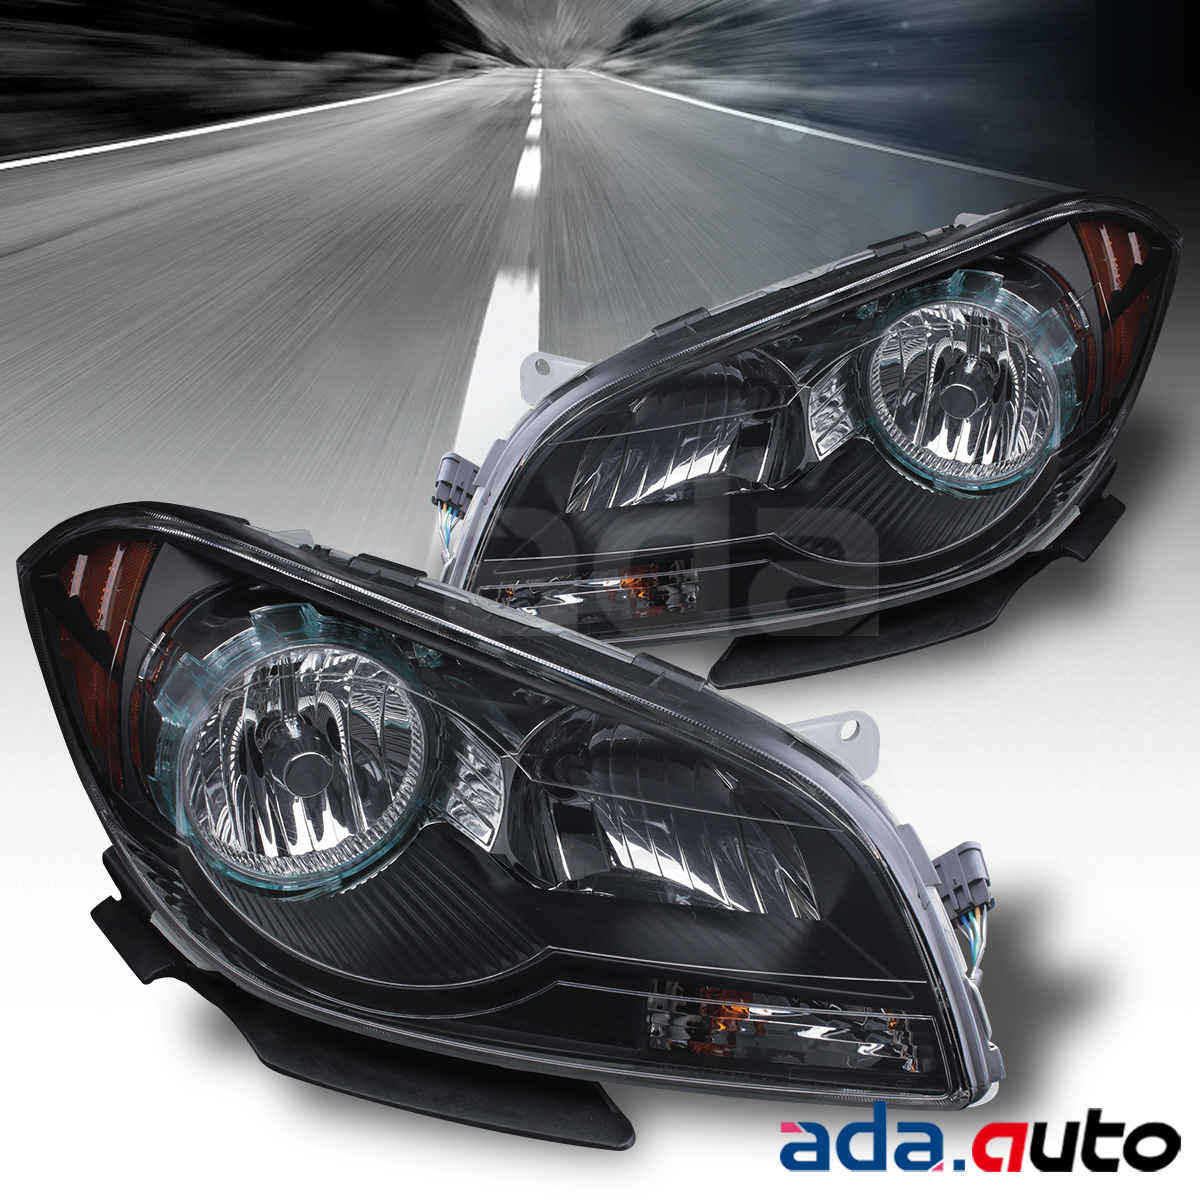 2008 2009 2010 2011 2012 Chevy Malibu Black Headlights